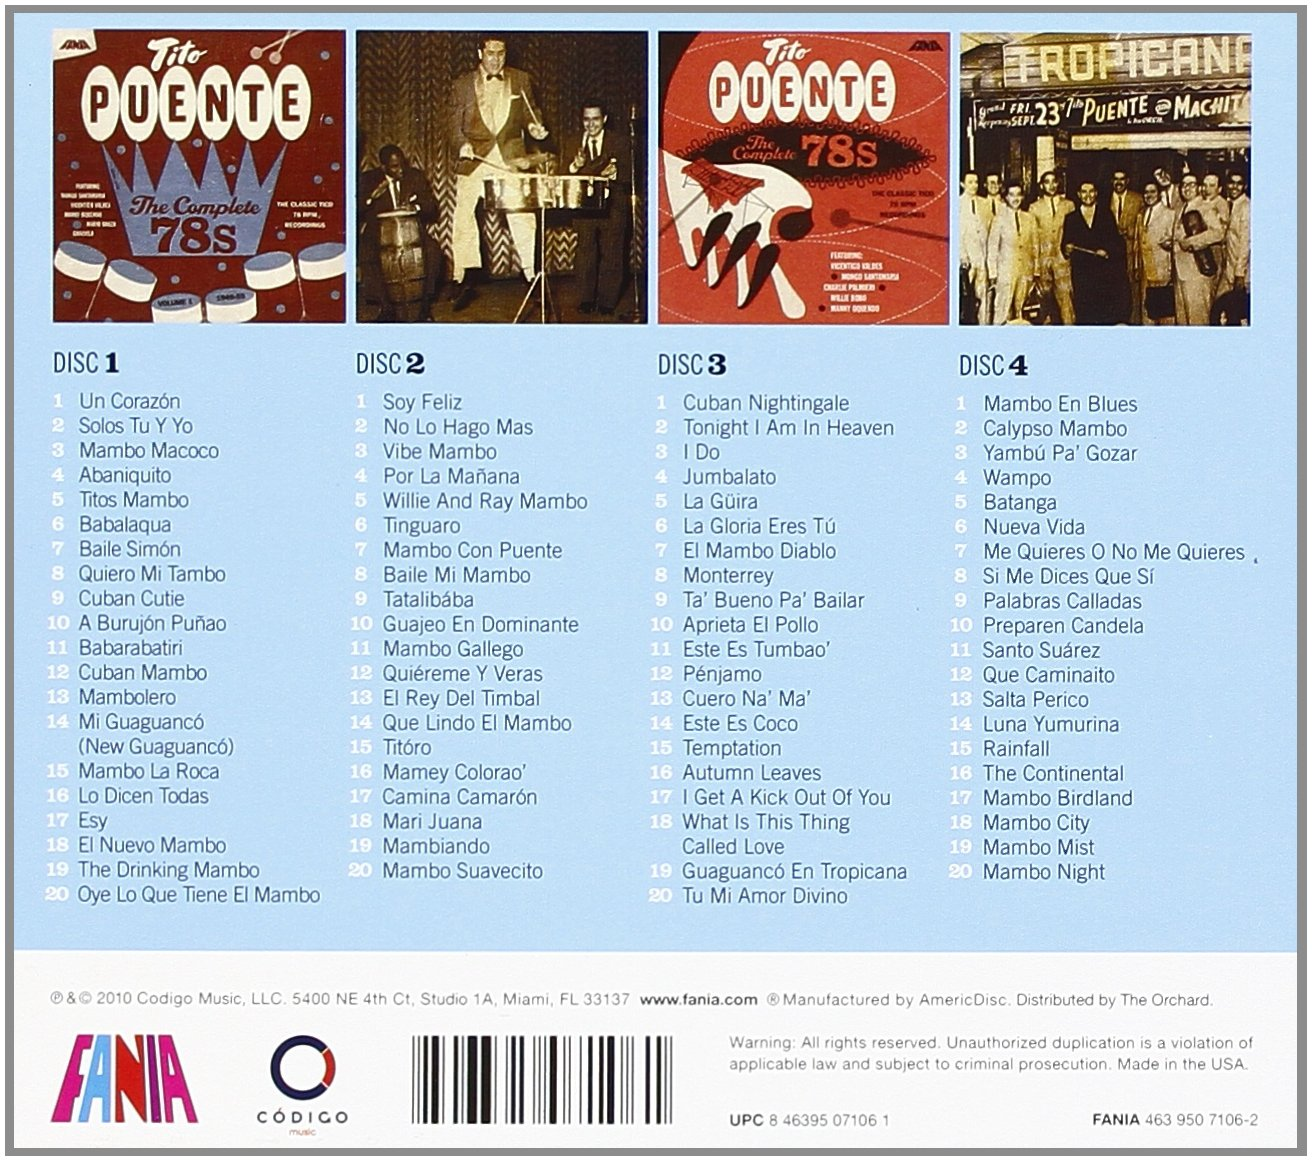 The Complete 78s Volume 1 & 2